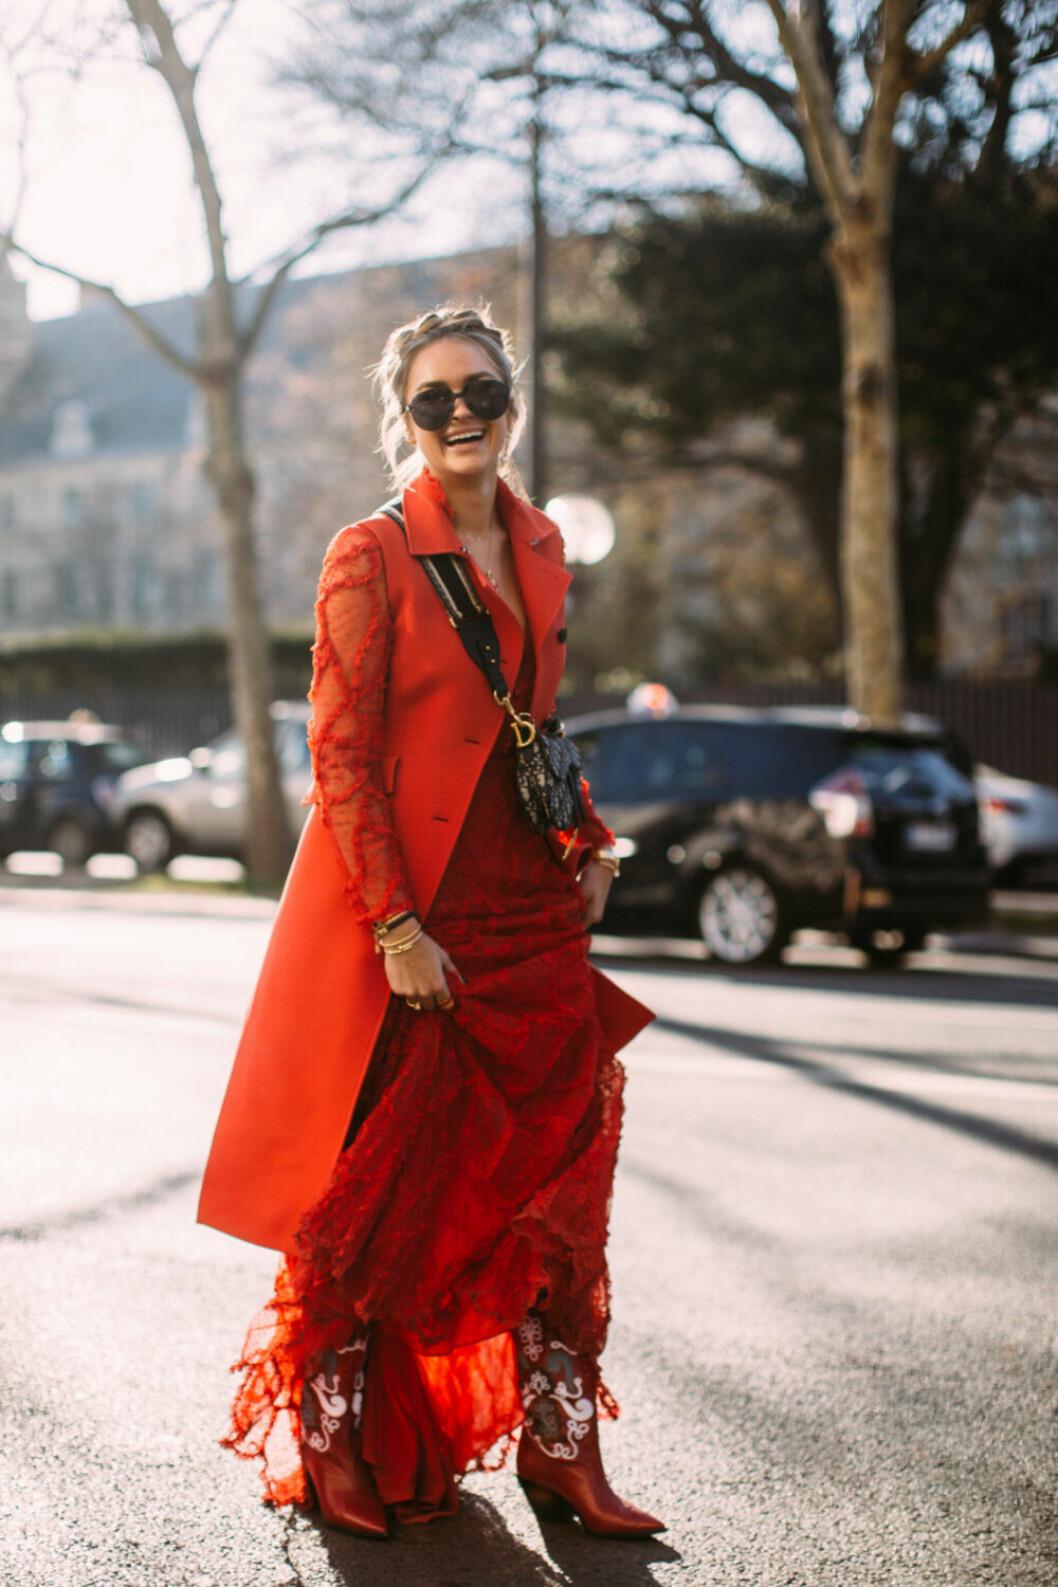 Streetstyle Paris FW, röd look från Dior.